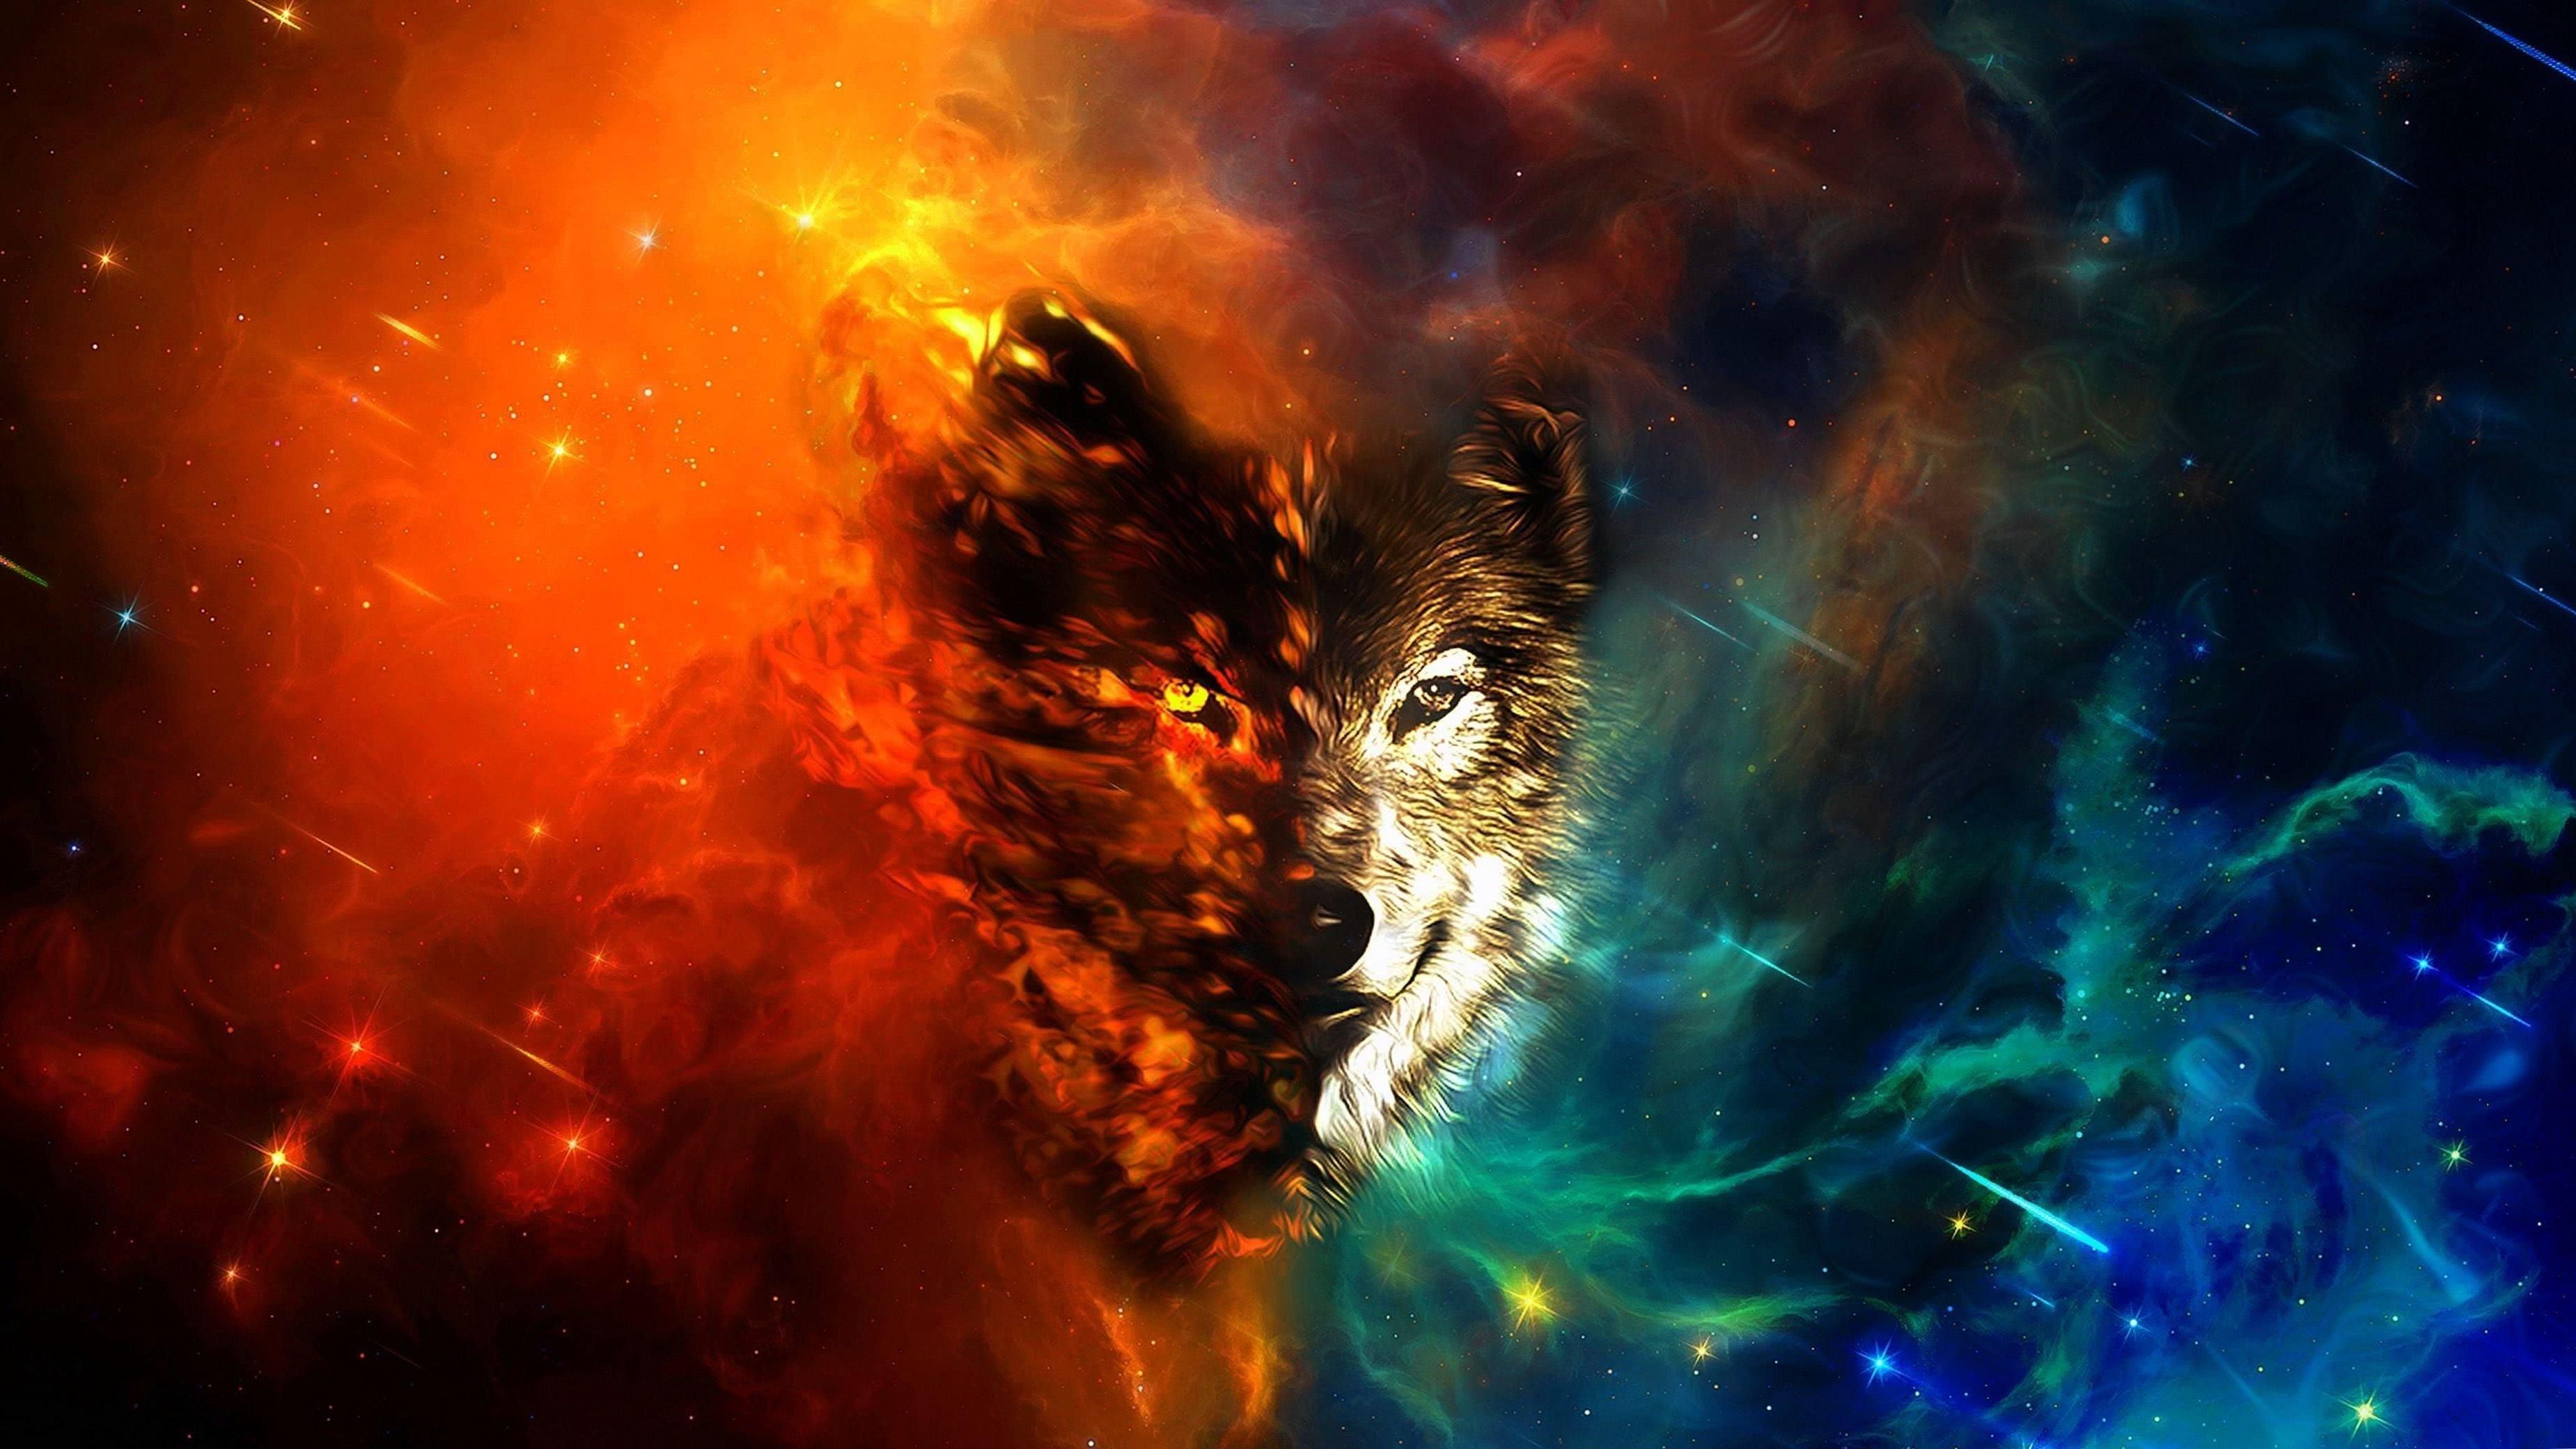 Wolf Art HD Wallpapers